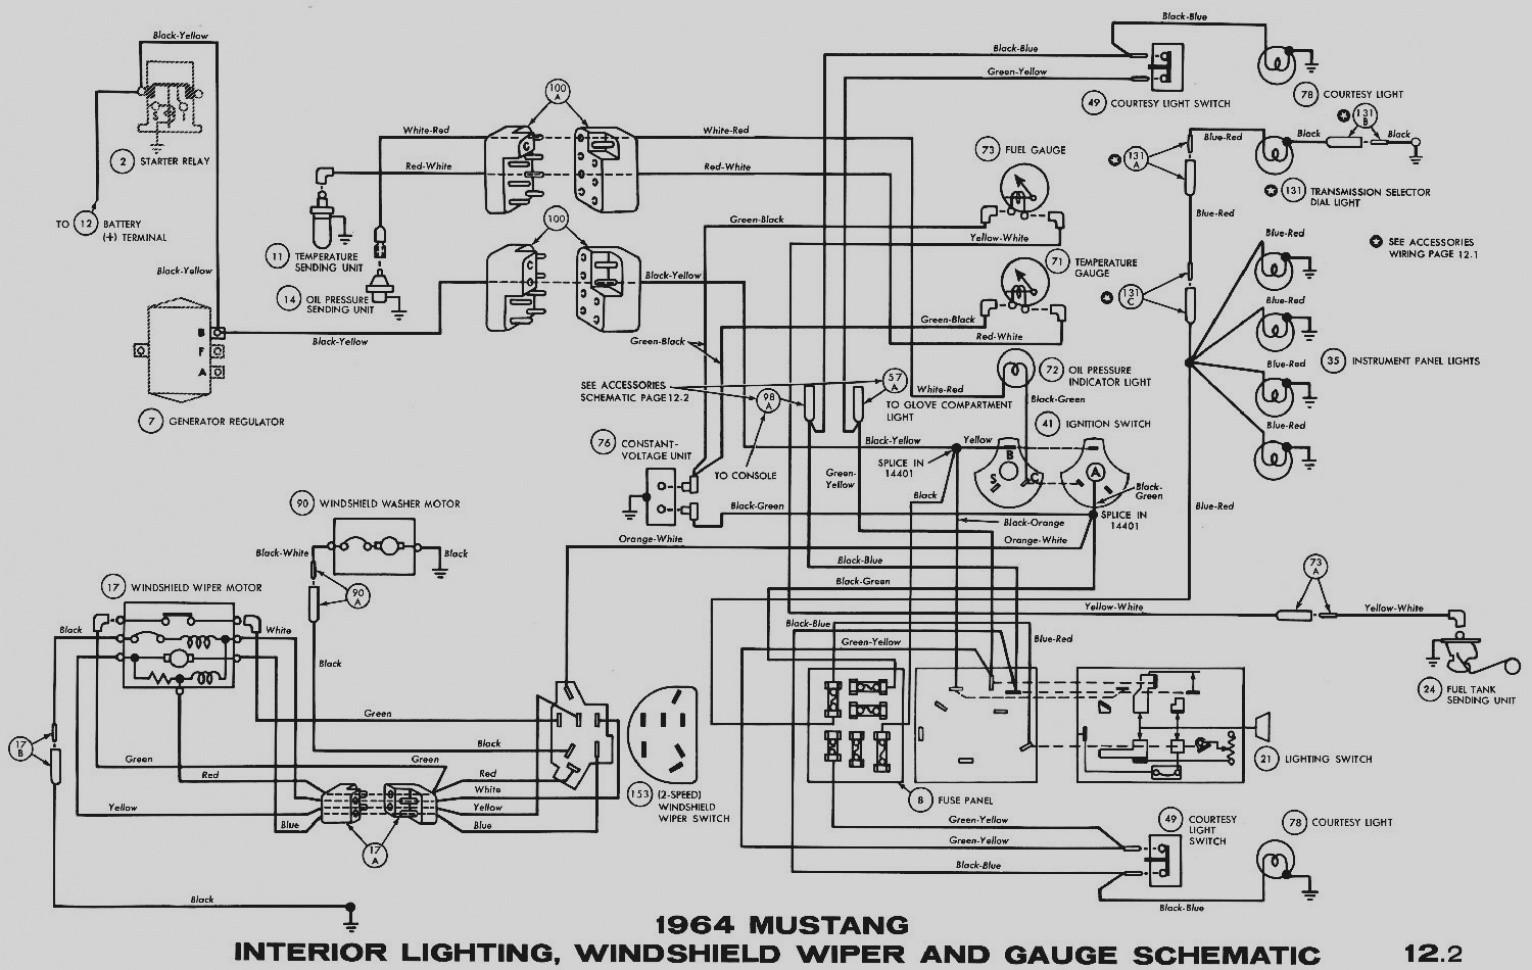 1975 C10 Wiring Diagram | Wiring Library